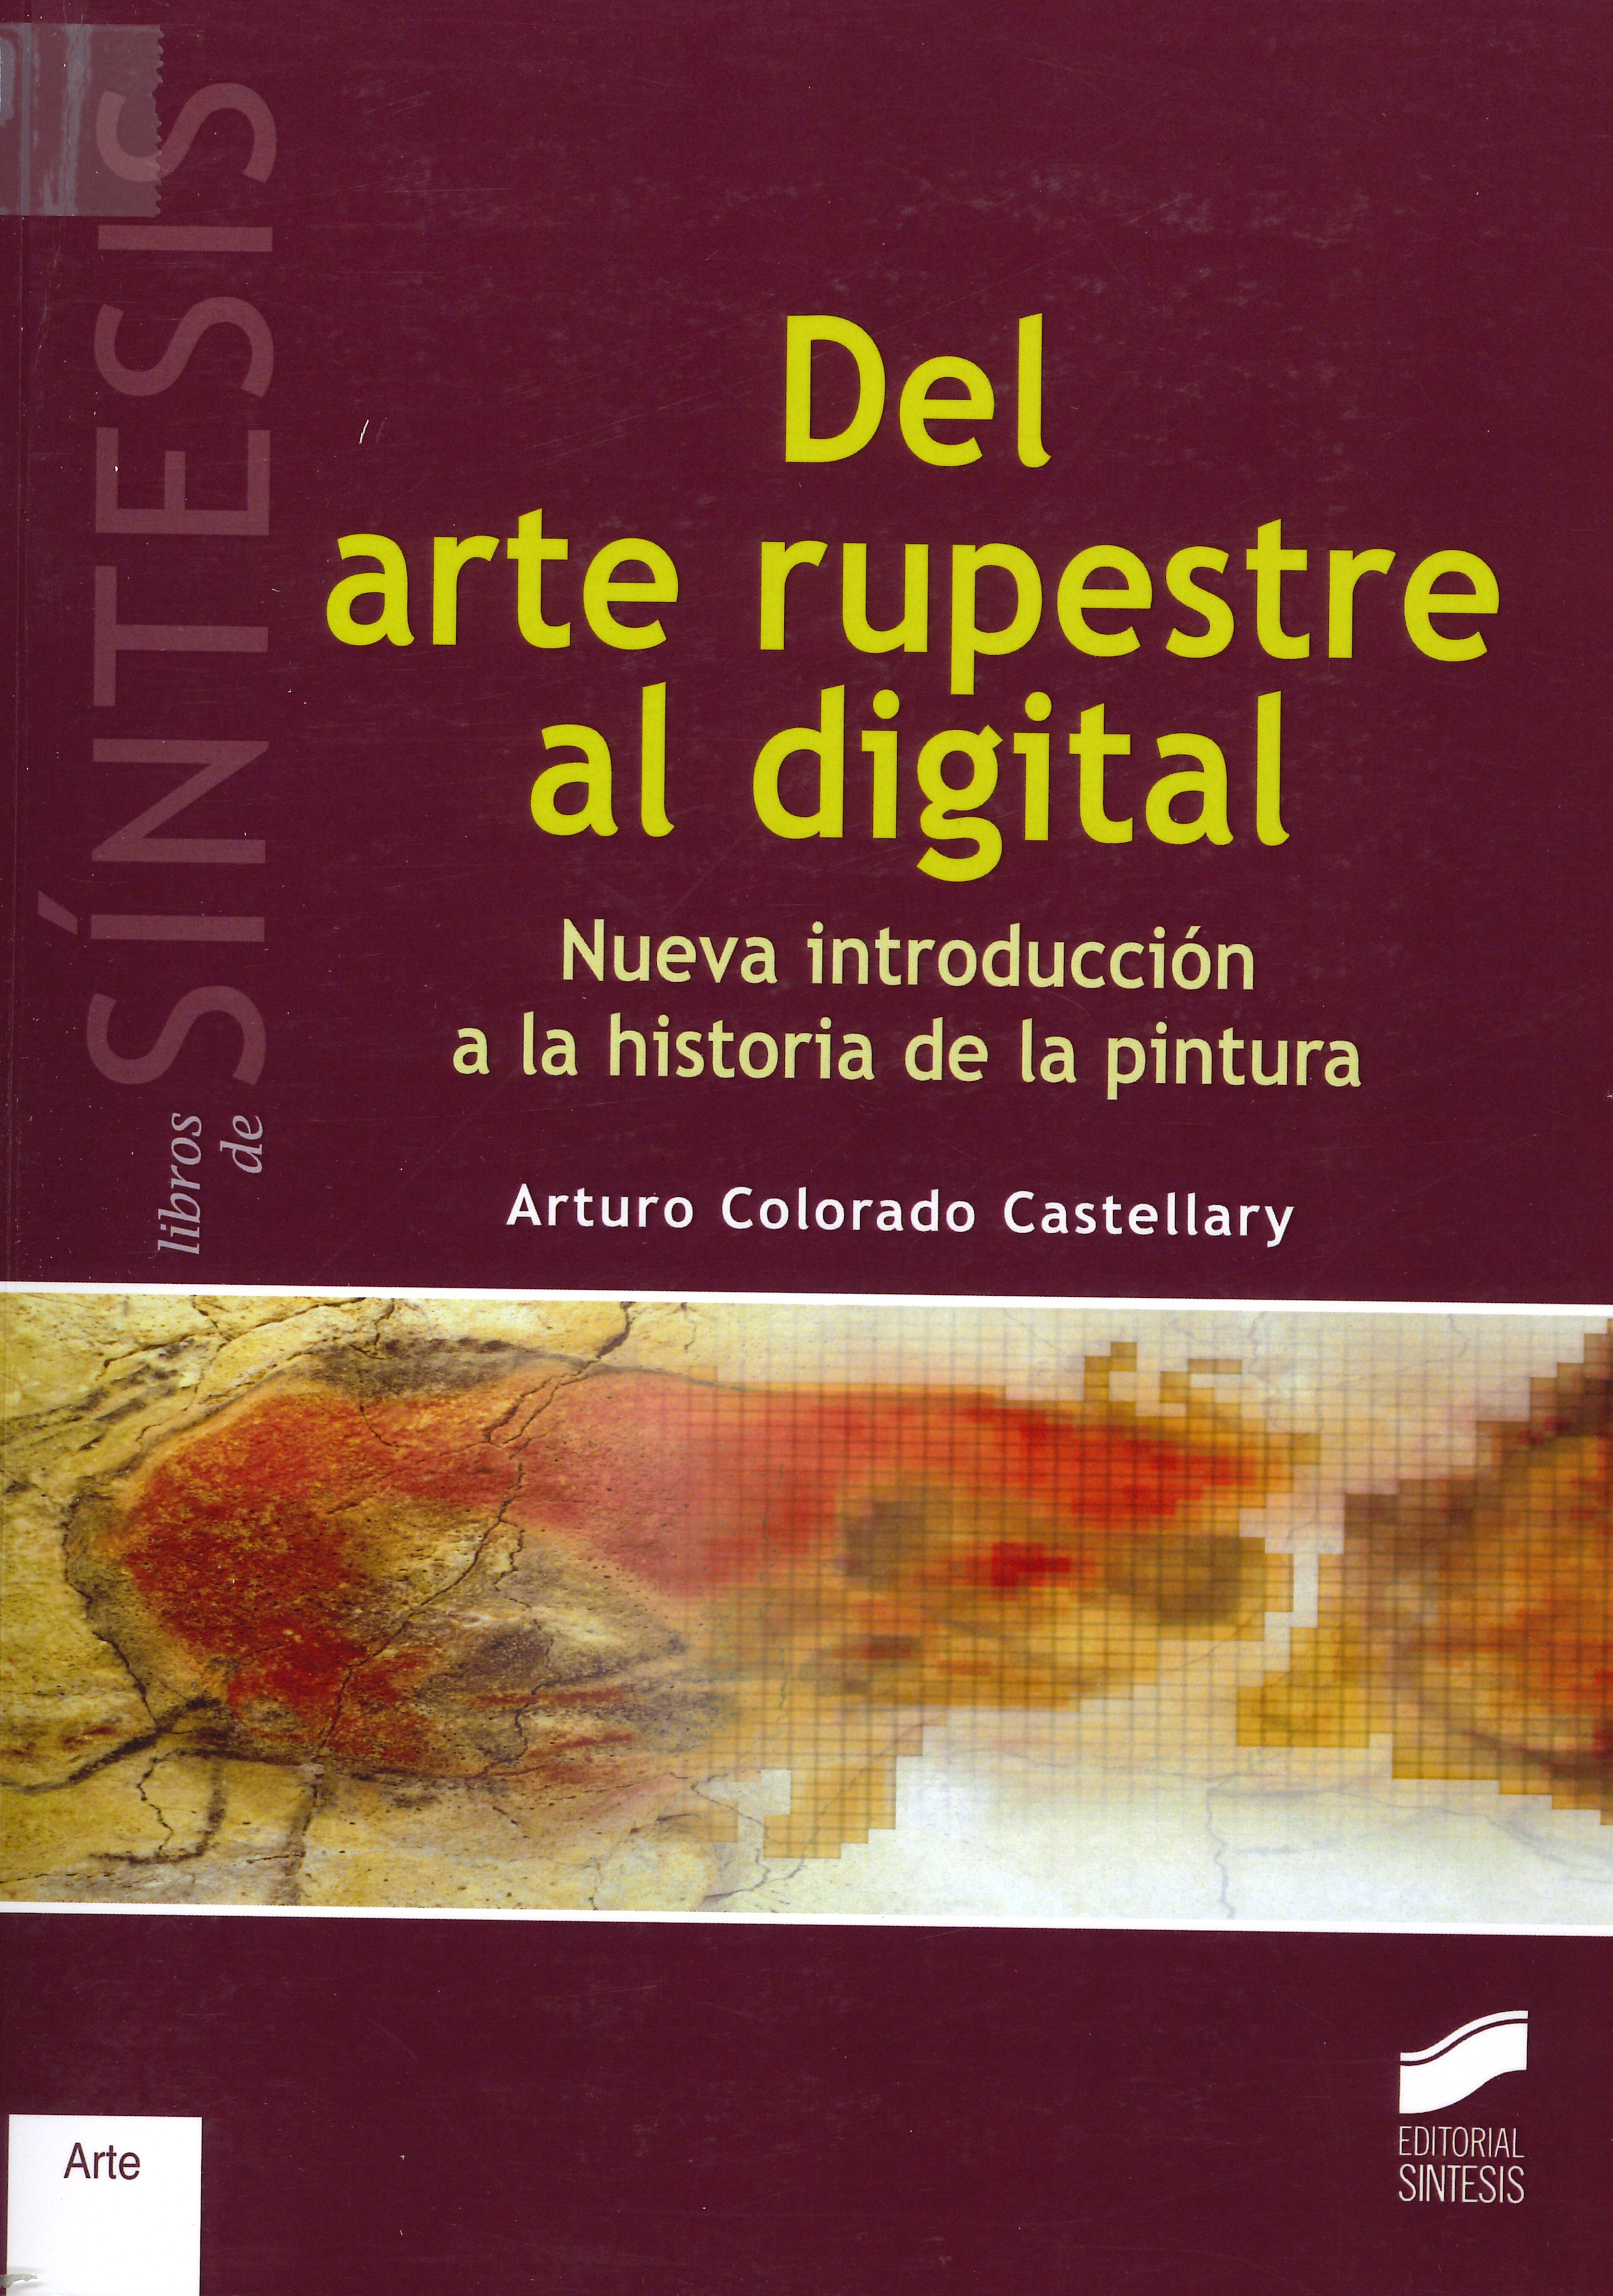 del_arte_rupestre_al_digital.jpg